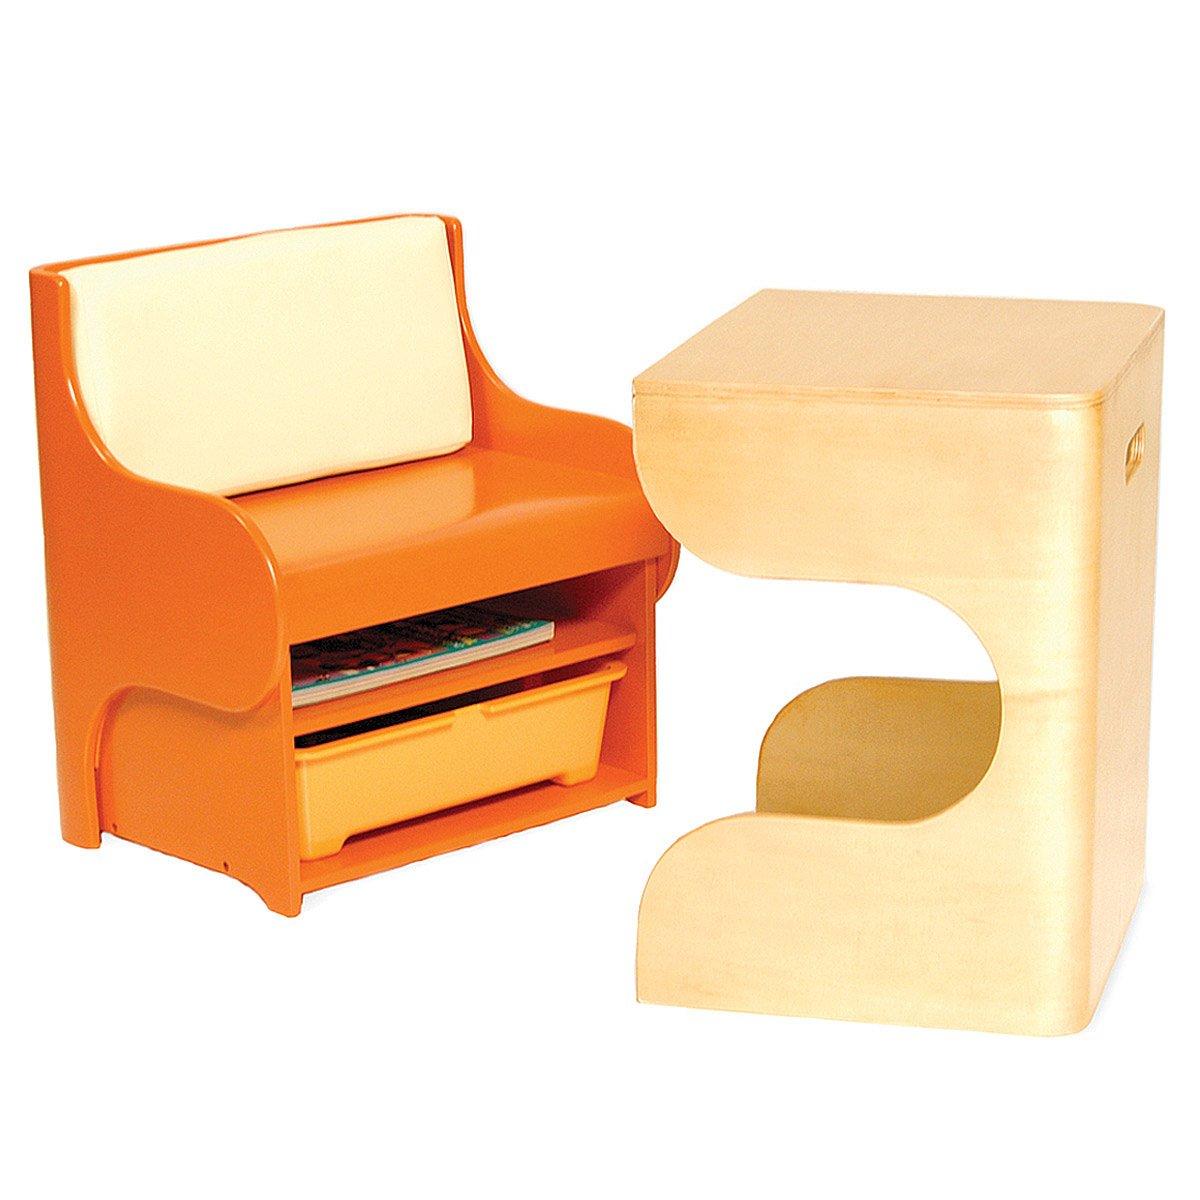 p kolino chair - klick desk and chair set desk for toddlers p'kolino uncommongoods